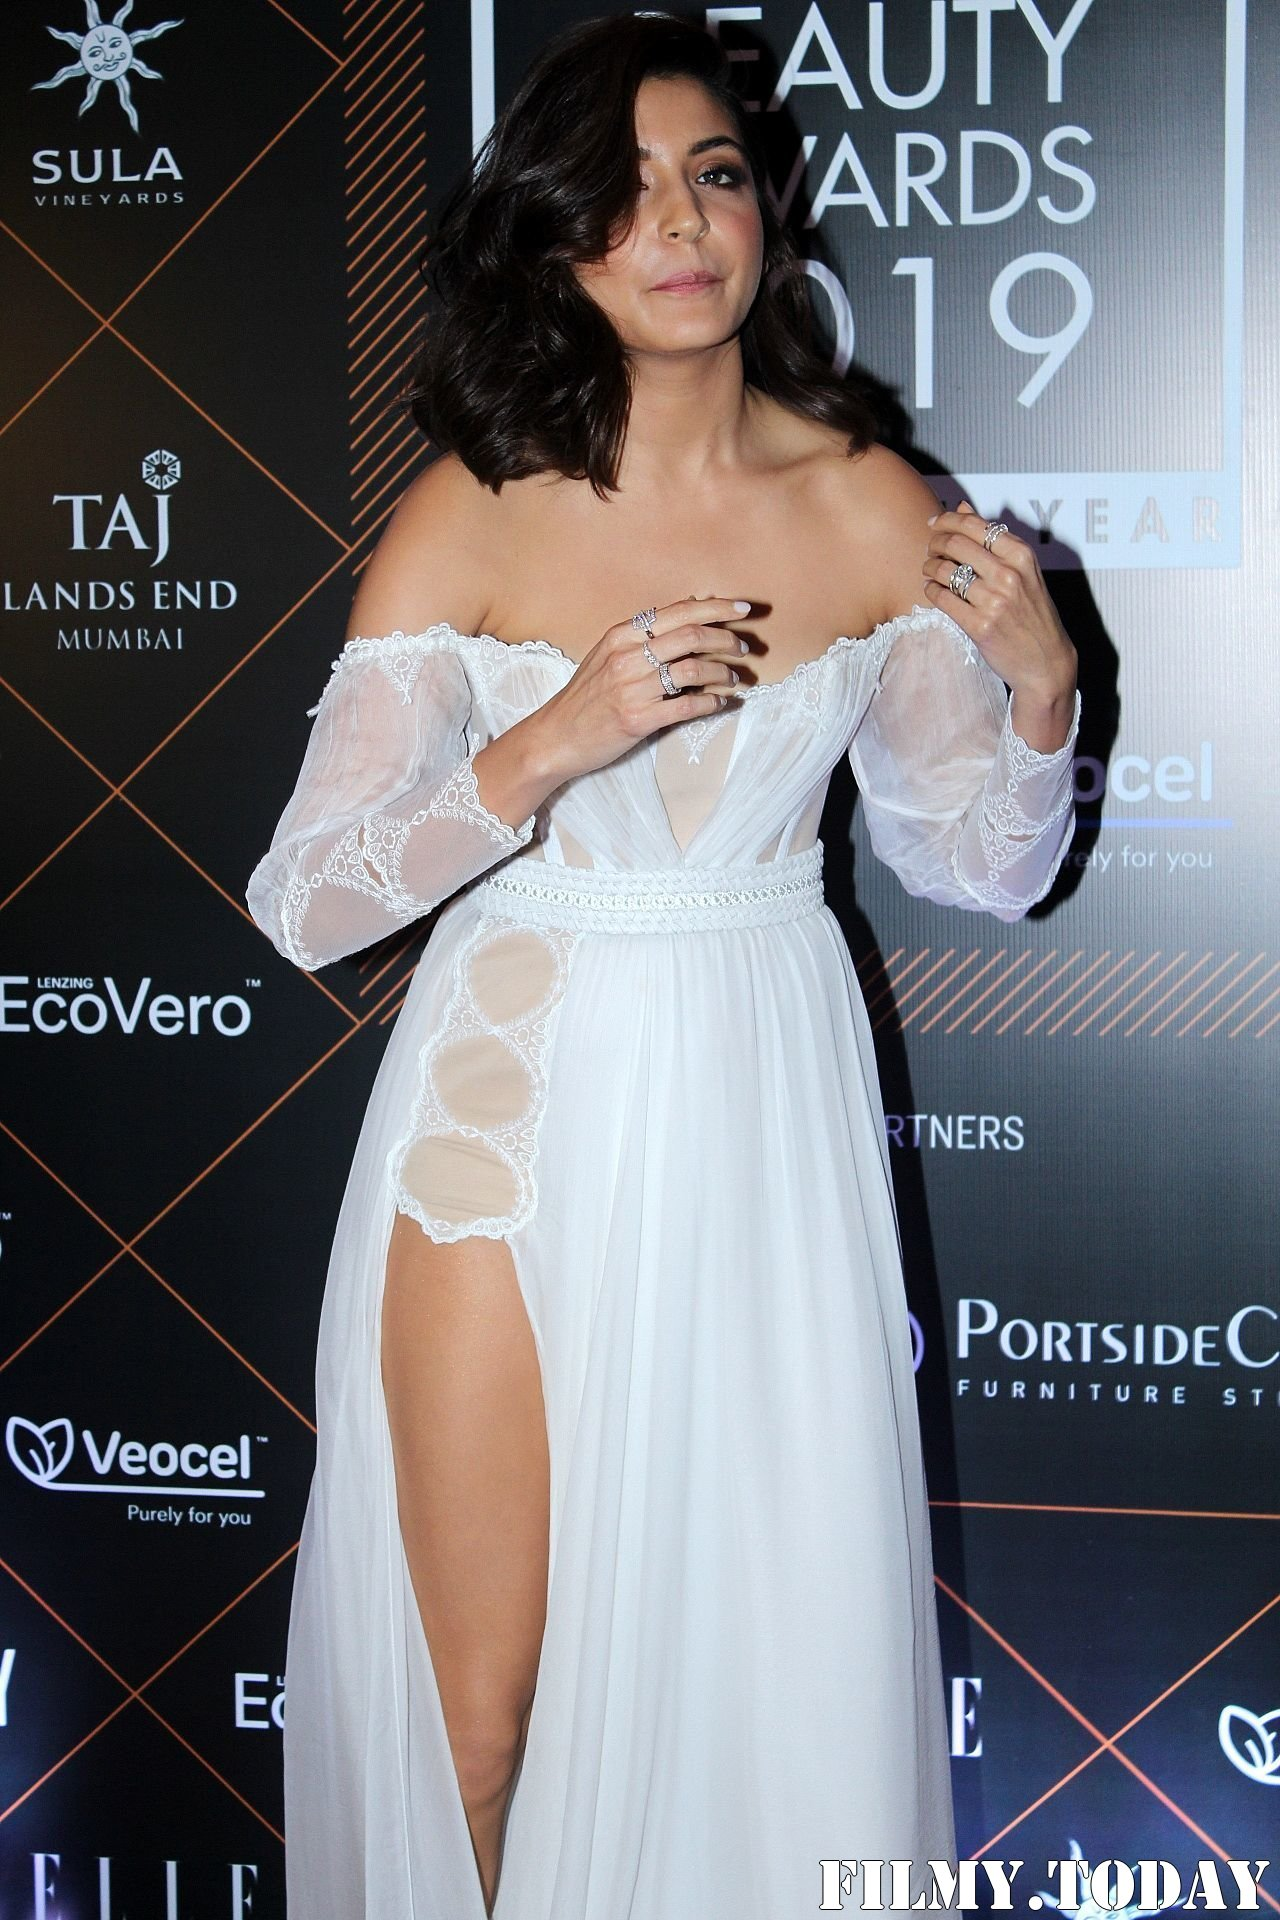 Anushka Sharma - Photos: Elle Beauty Awards 2019 | Picture 1689781